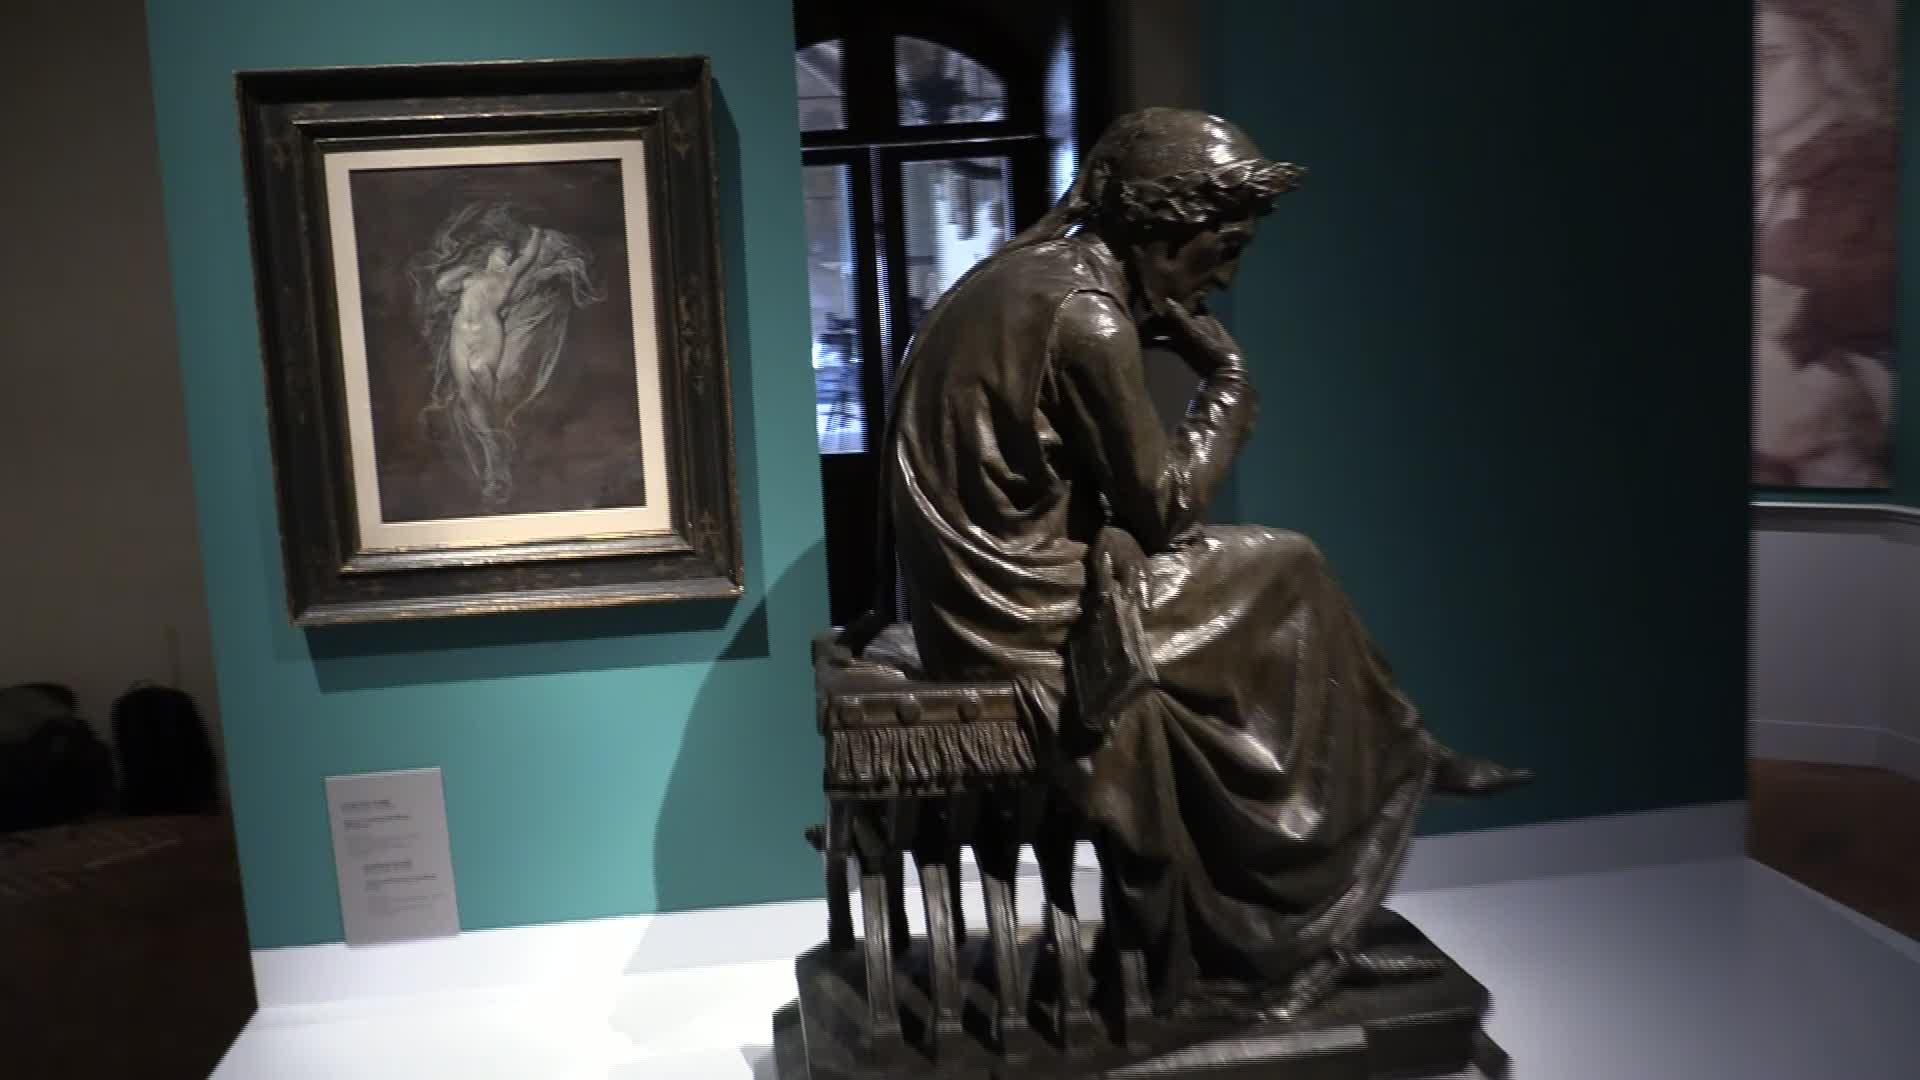 A firenze la mostra dedicata a Dante